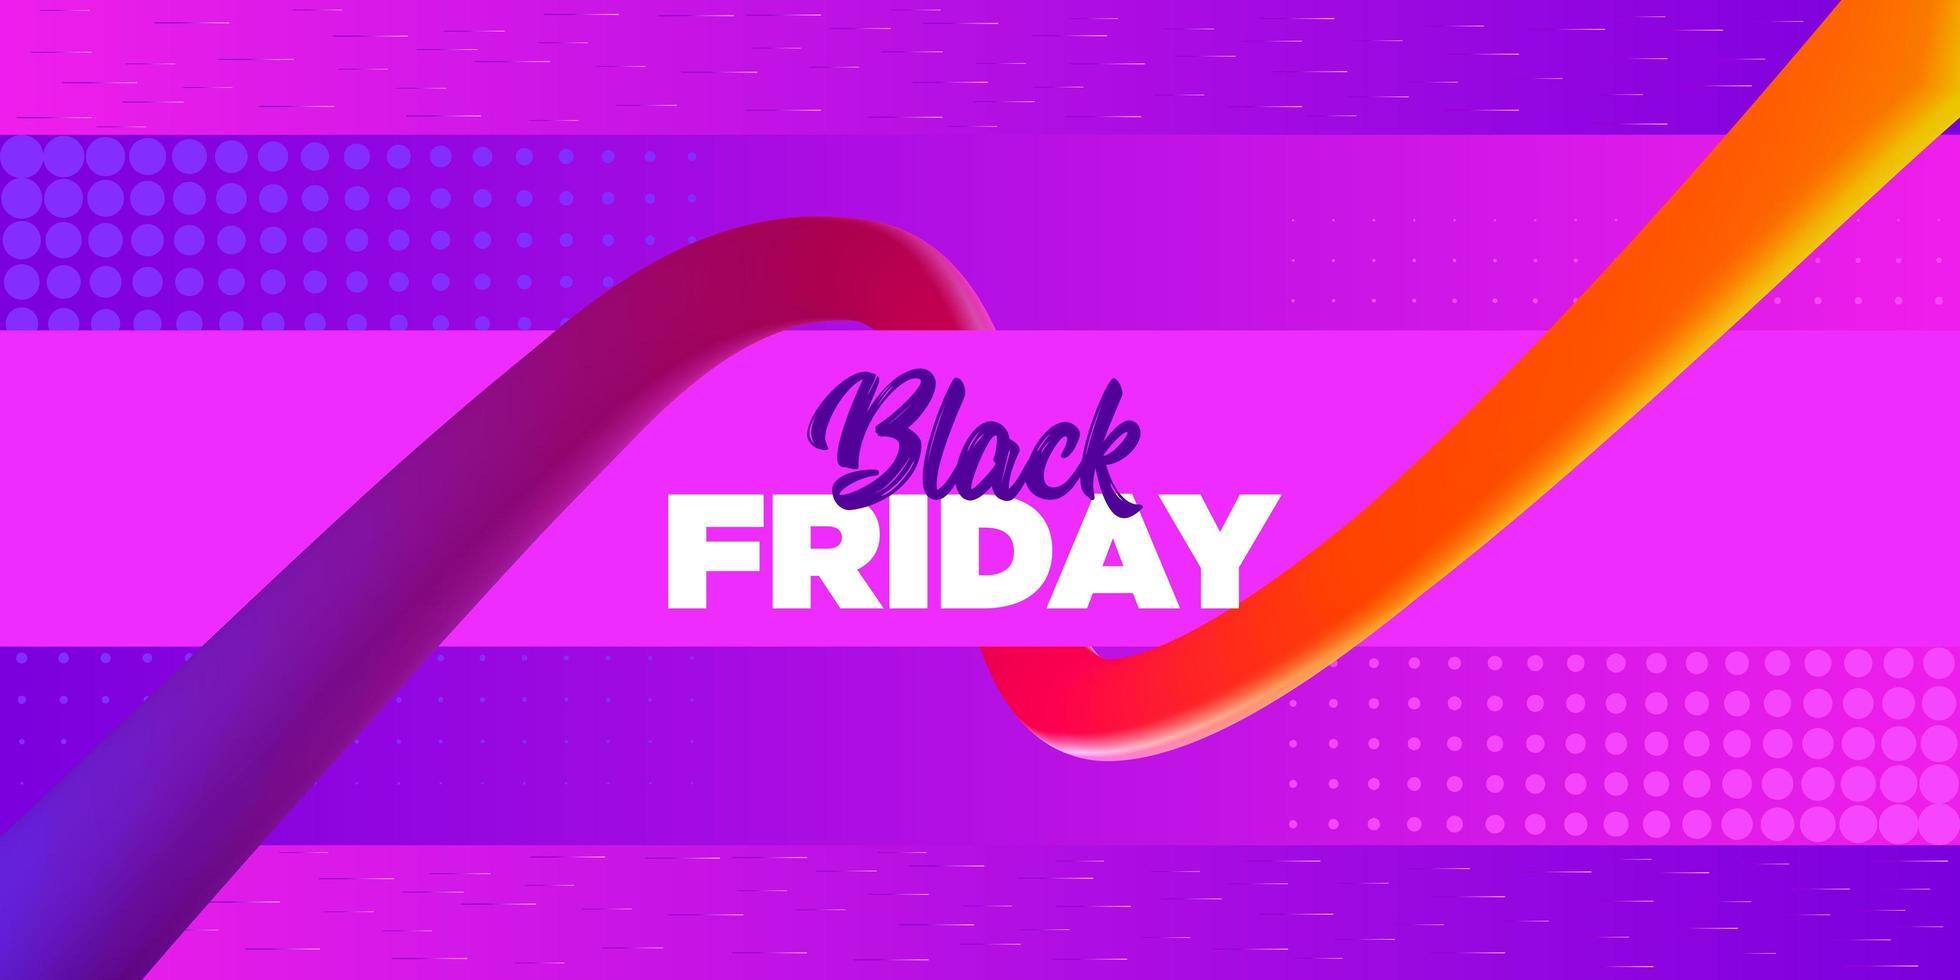 schwarzer Freitag hellrosa lila Verkauf Banner Design vektor